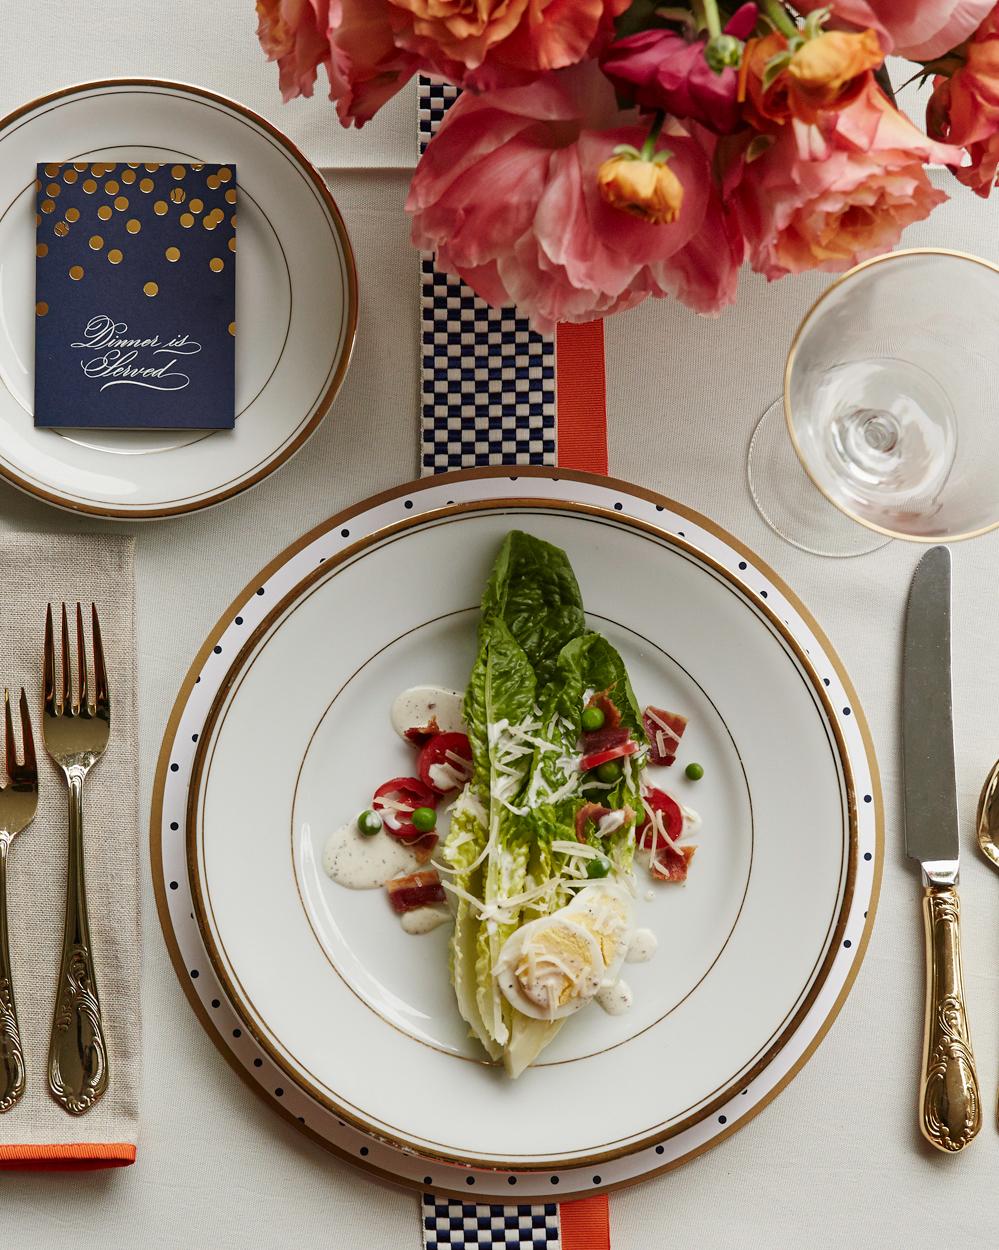 lydia-barritt-wedding-salad-0414.jpg